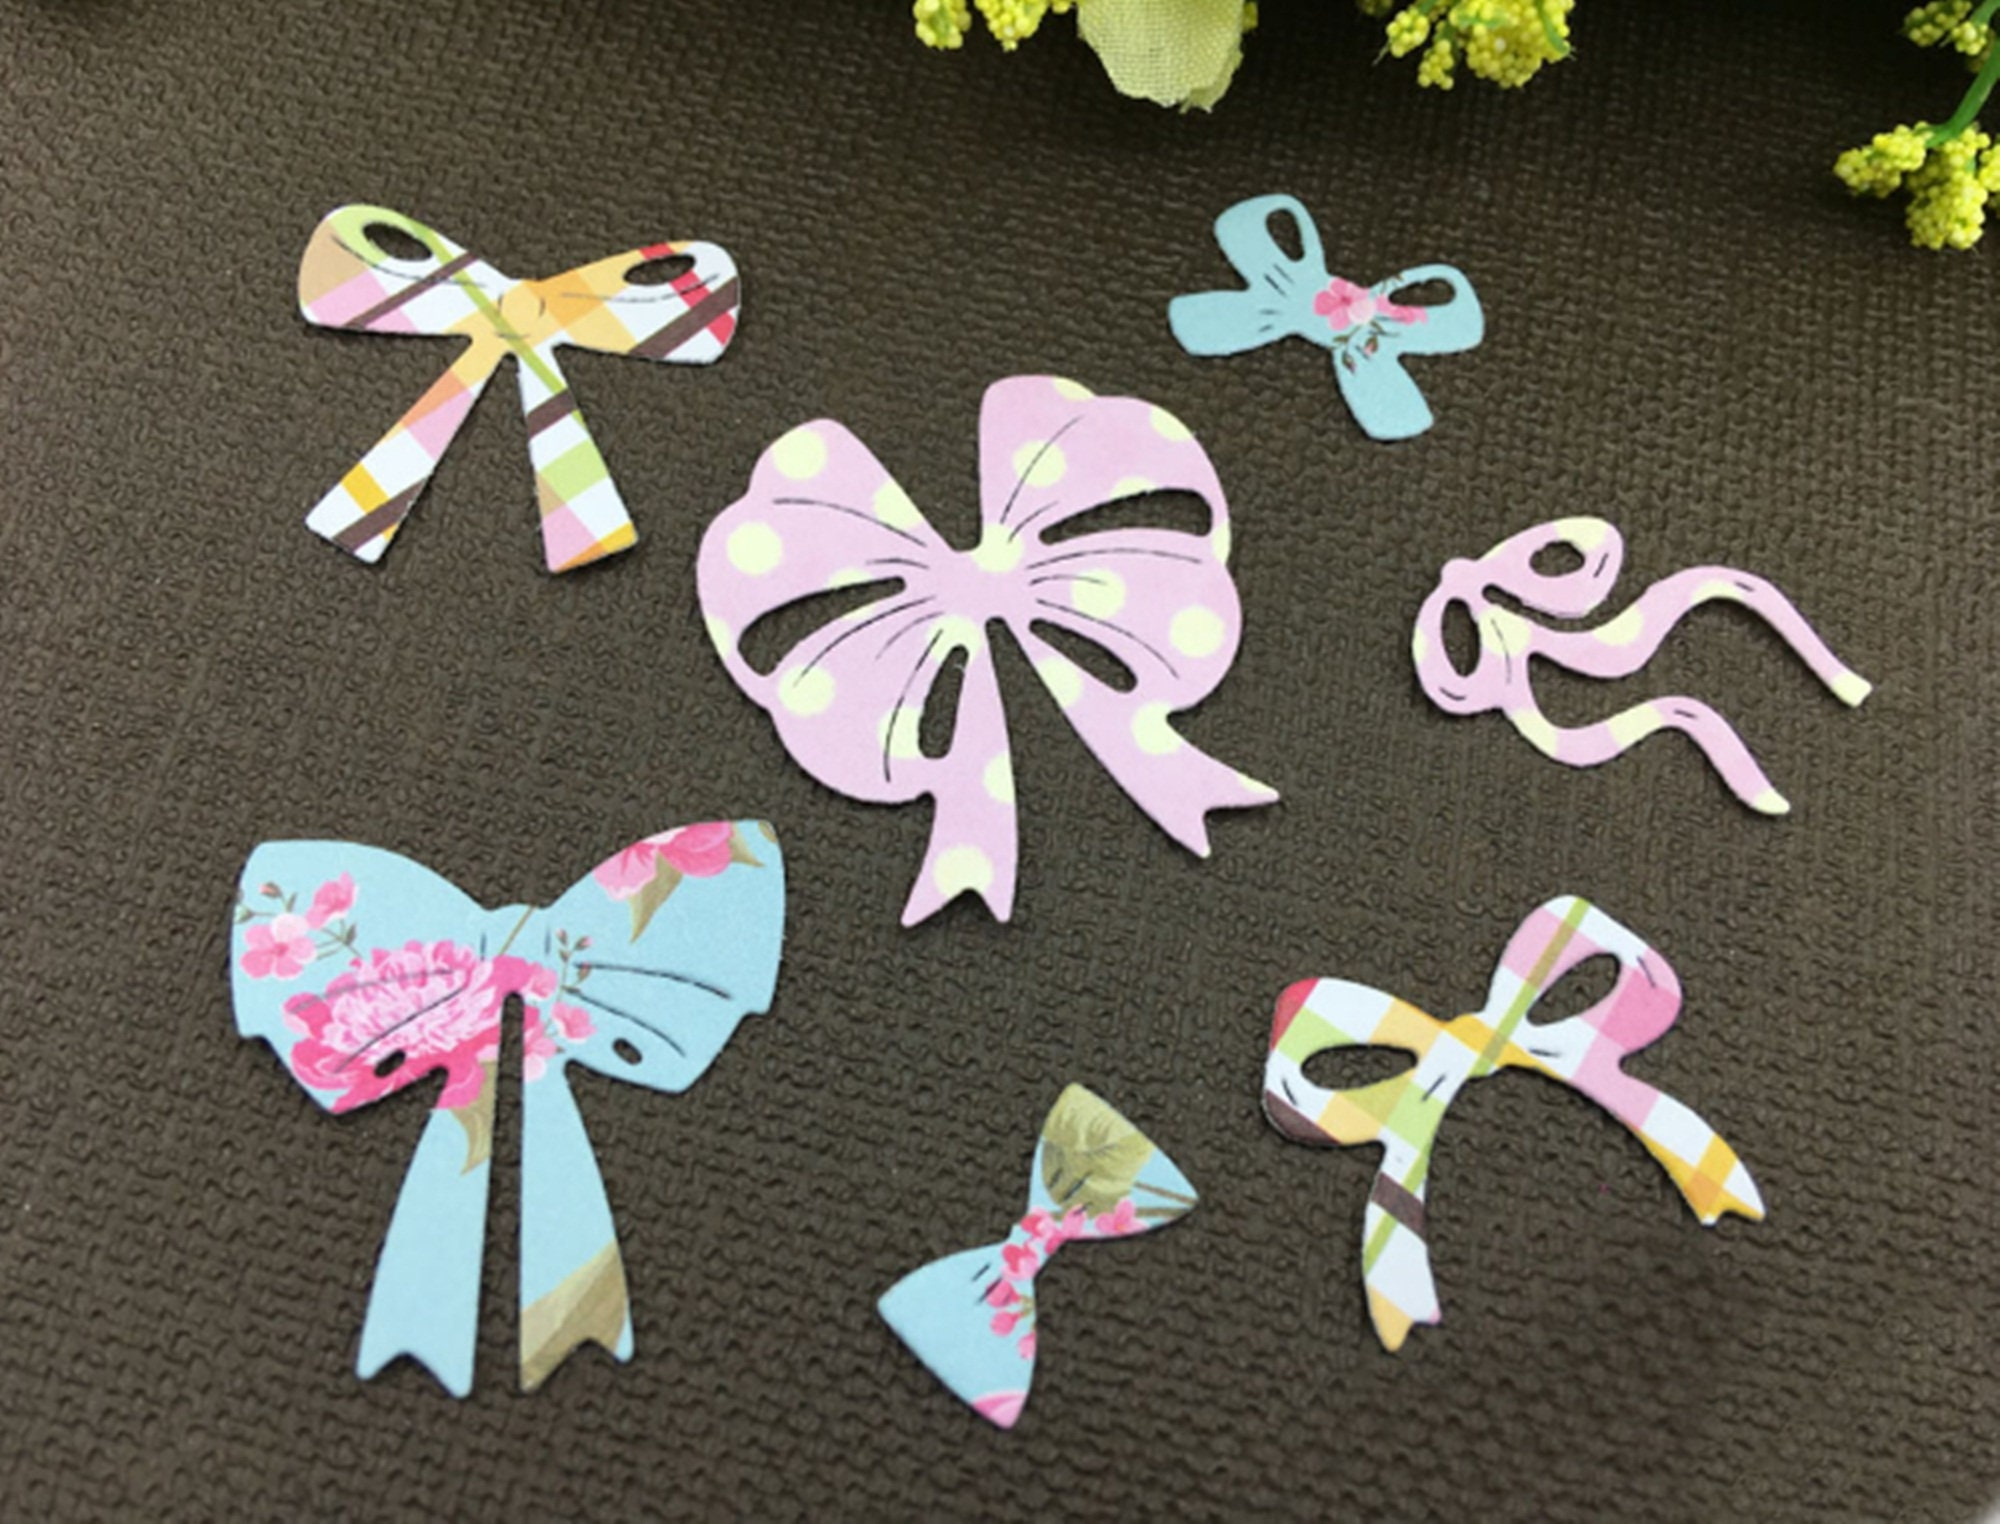 7pcs bow cutting dies stencil scrapbook album paper embossing craft diy RD